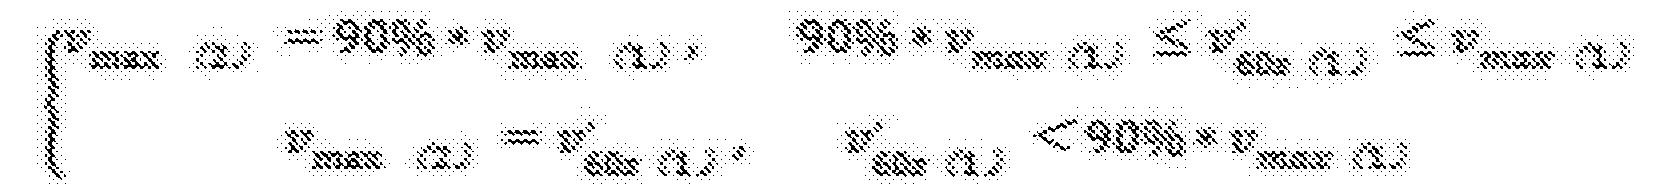 Figure CN106878303AD00101